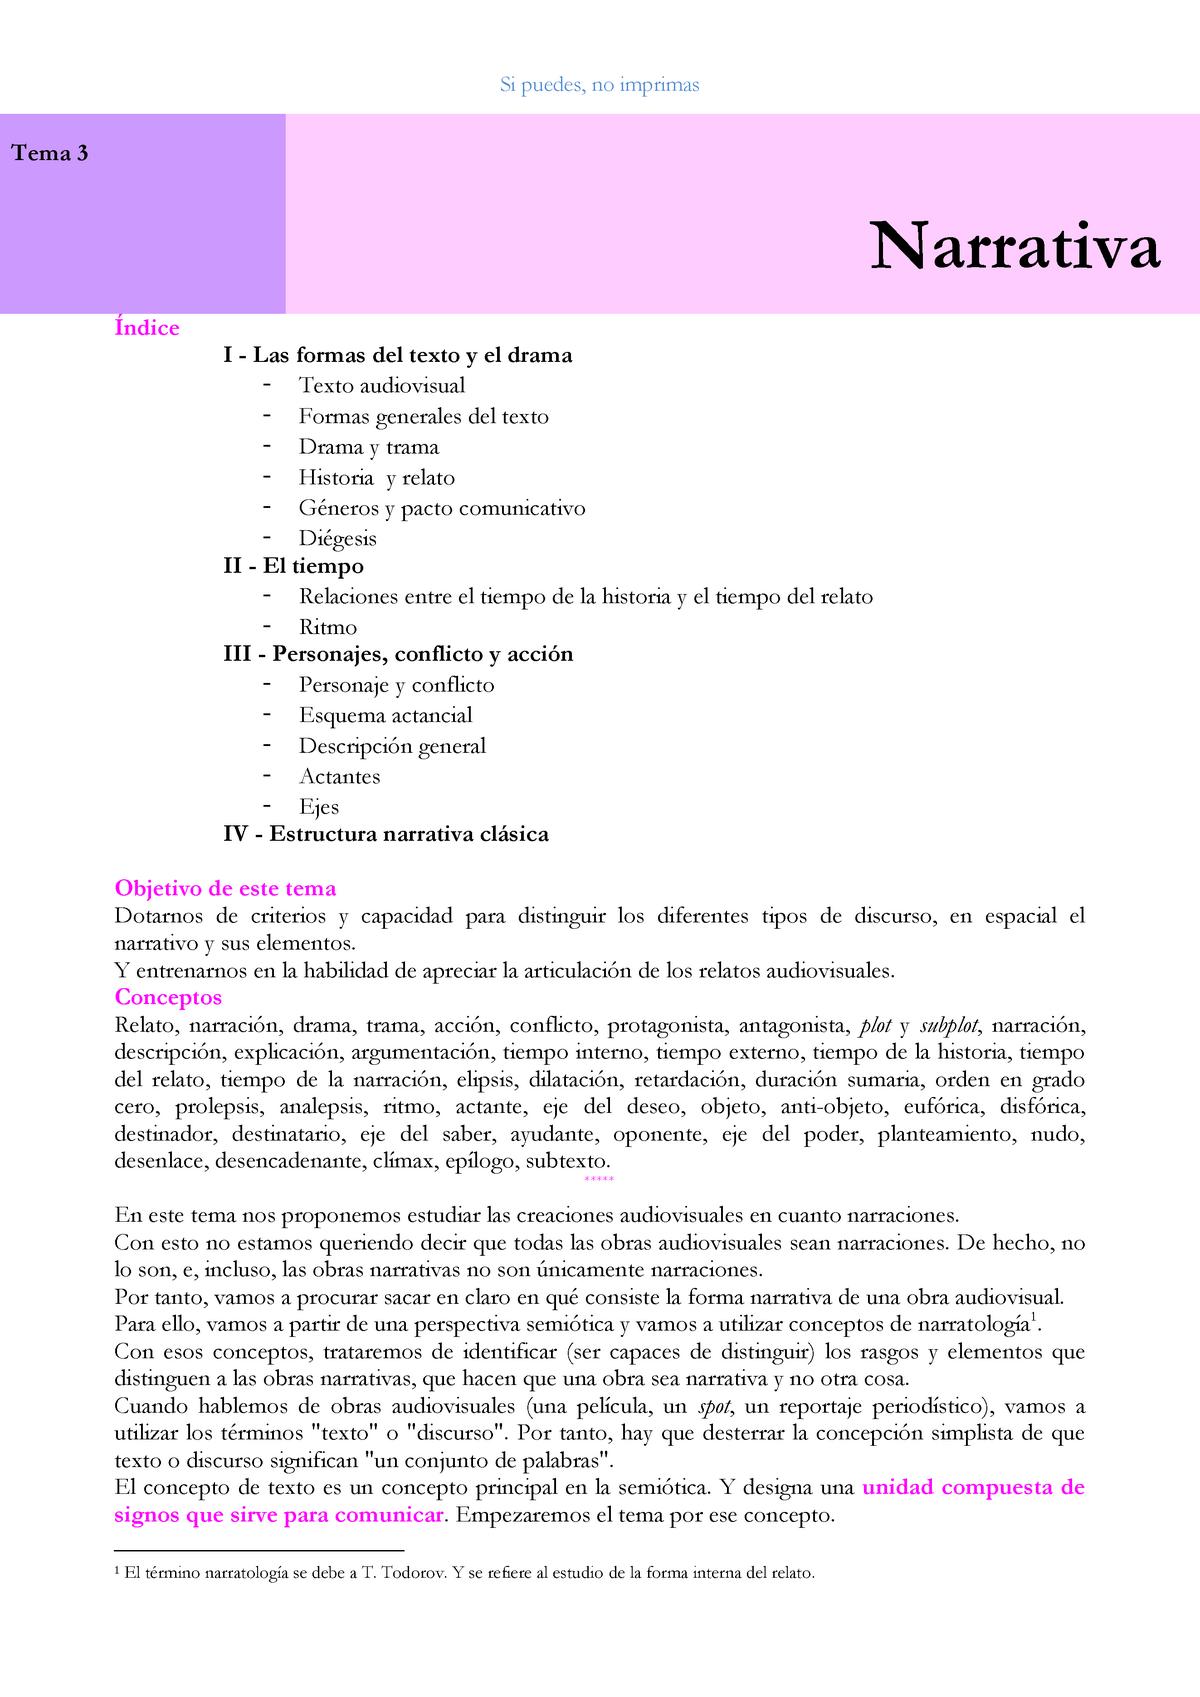 Tema 3 Narrativa Apuntes 3 Proceso Audiovisual 89889